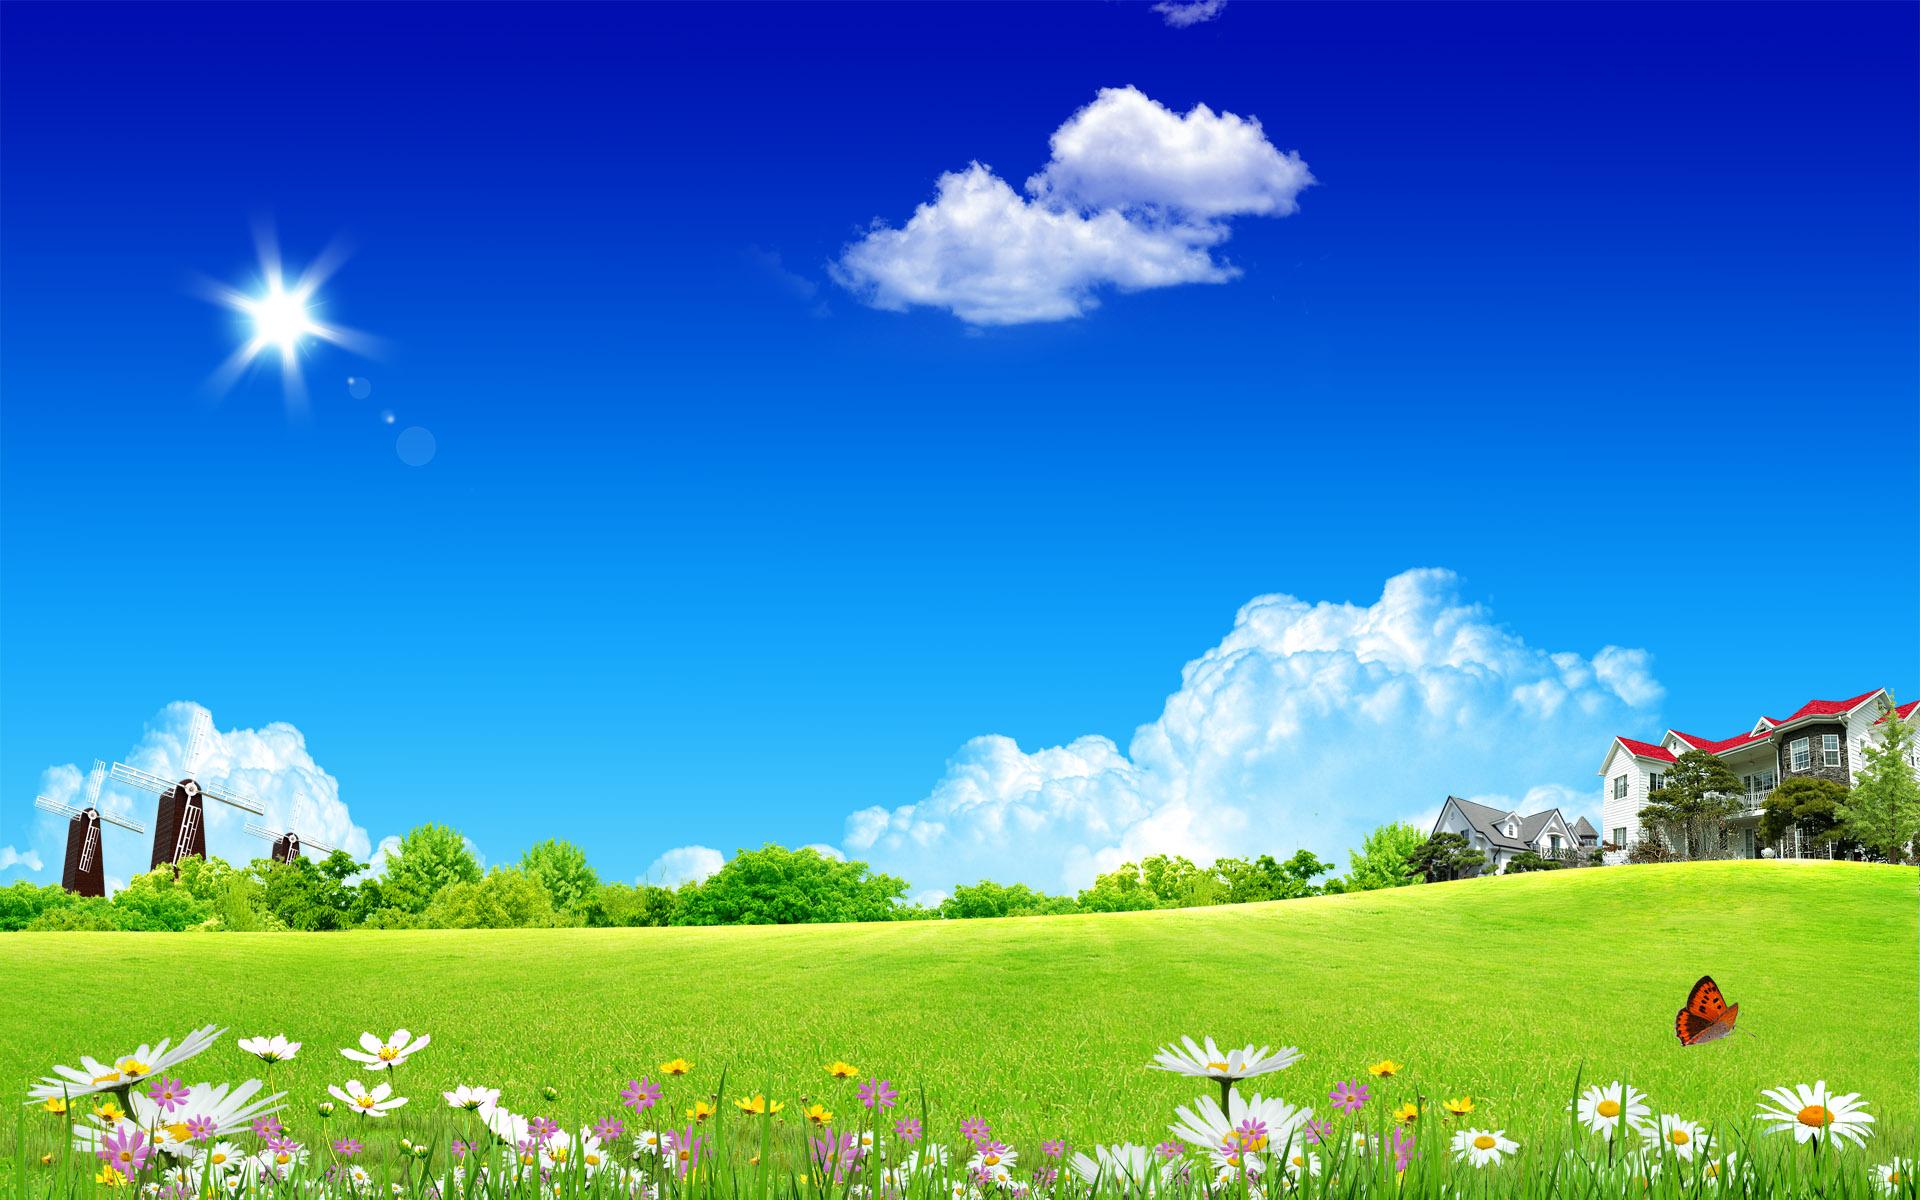 scenery wallpaper includes - photo #1